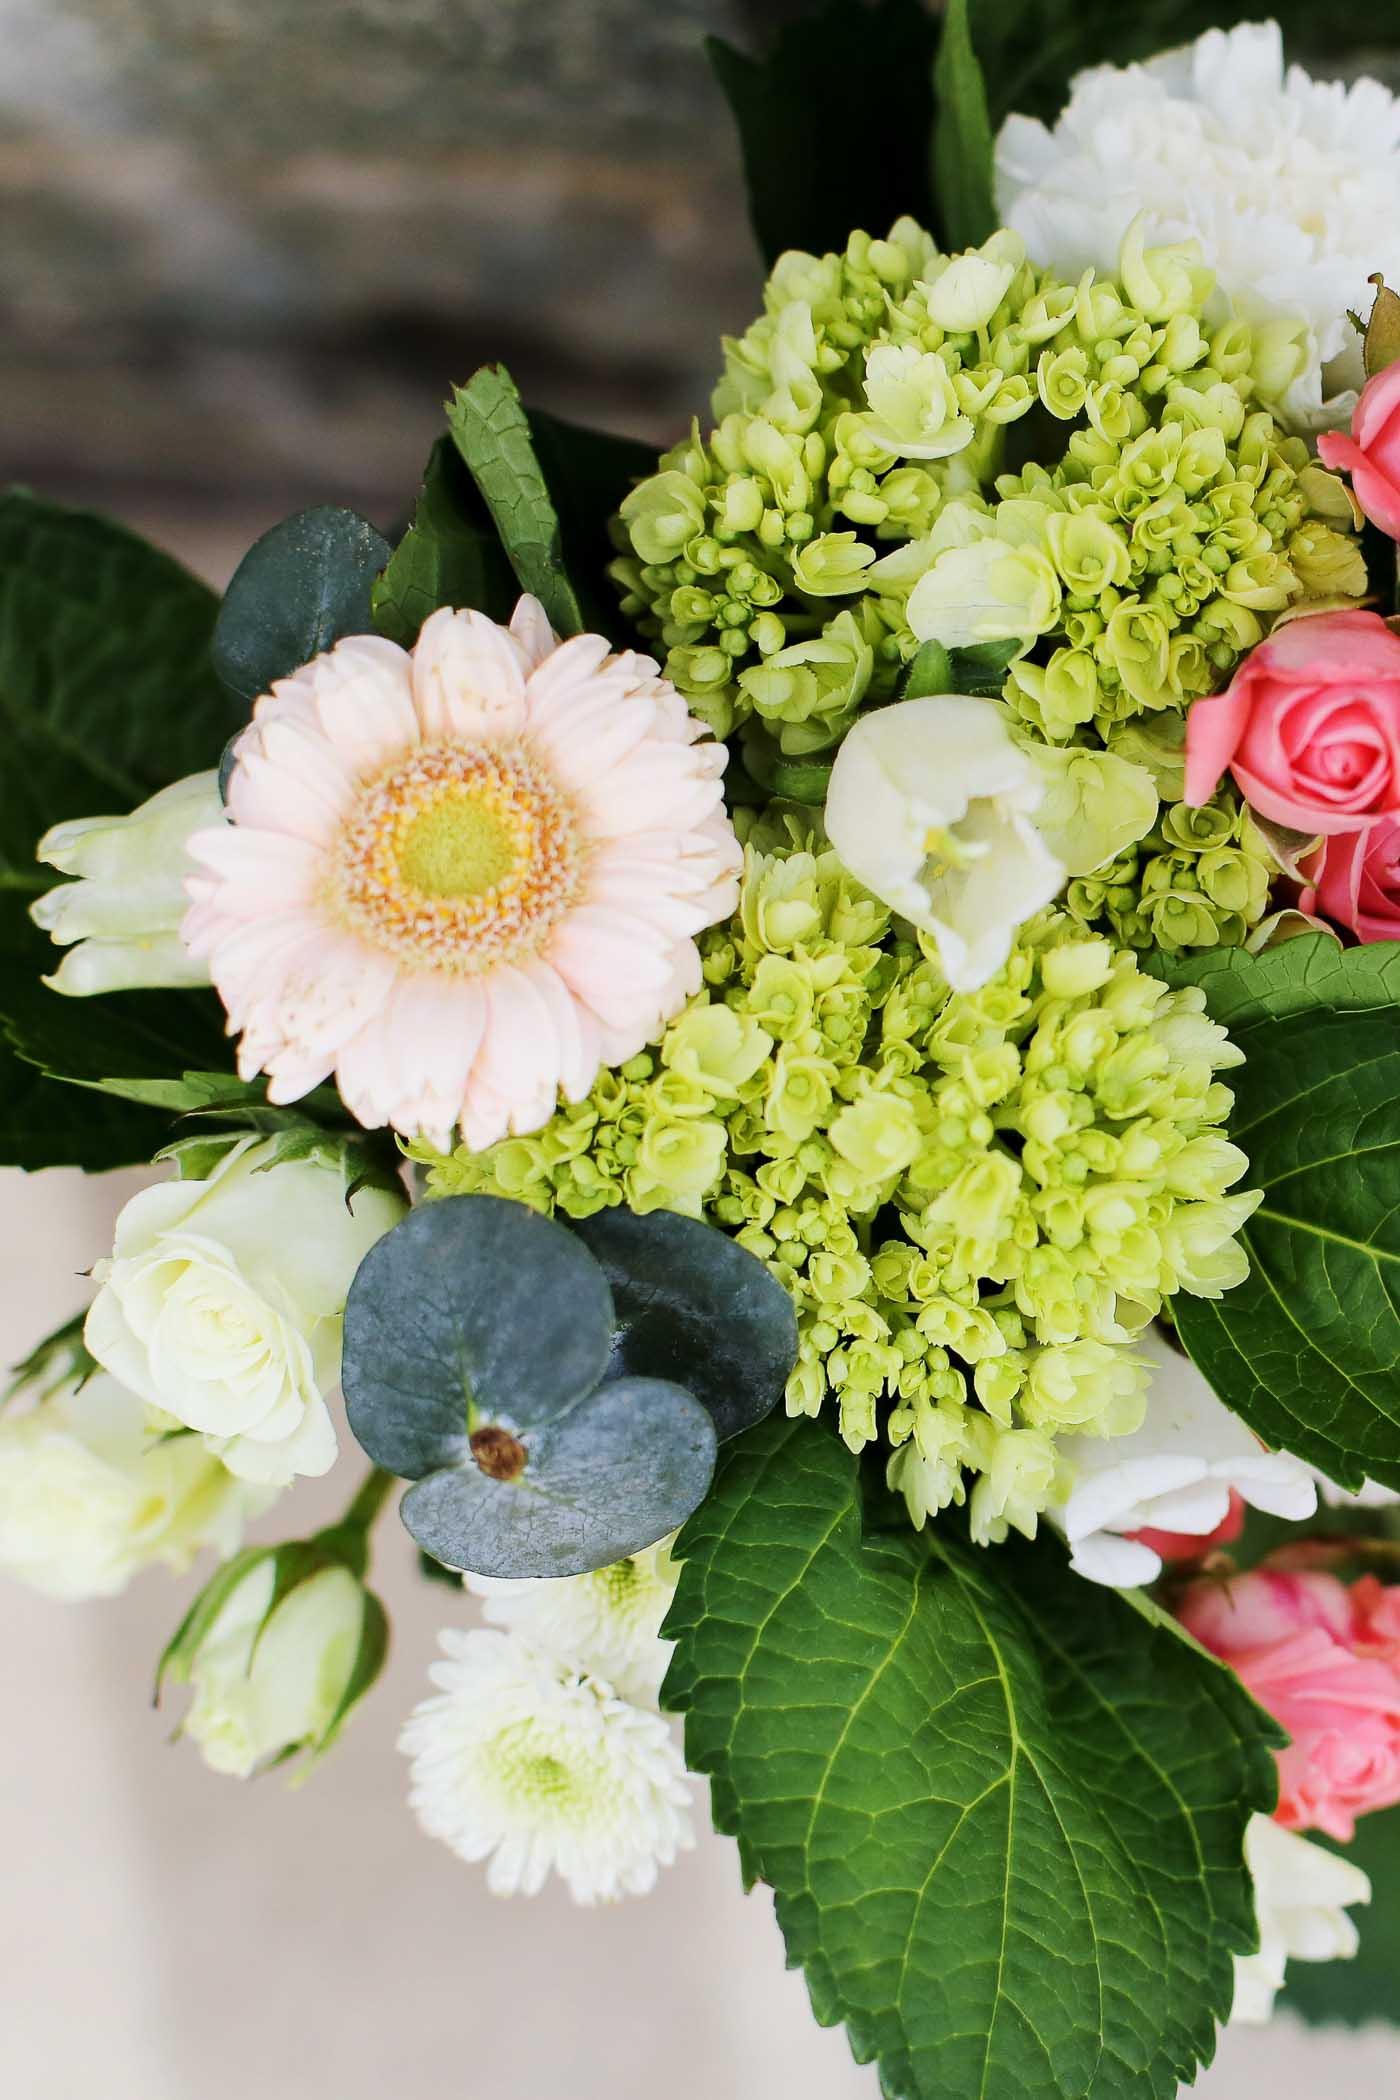 best blogging workshops, The Blog Societies, flowers